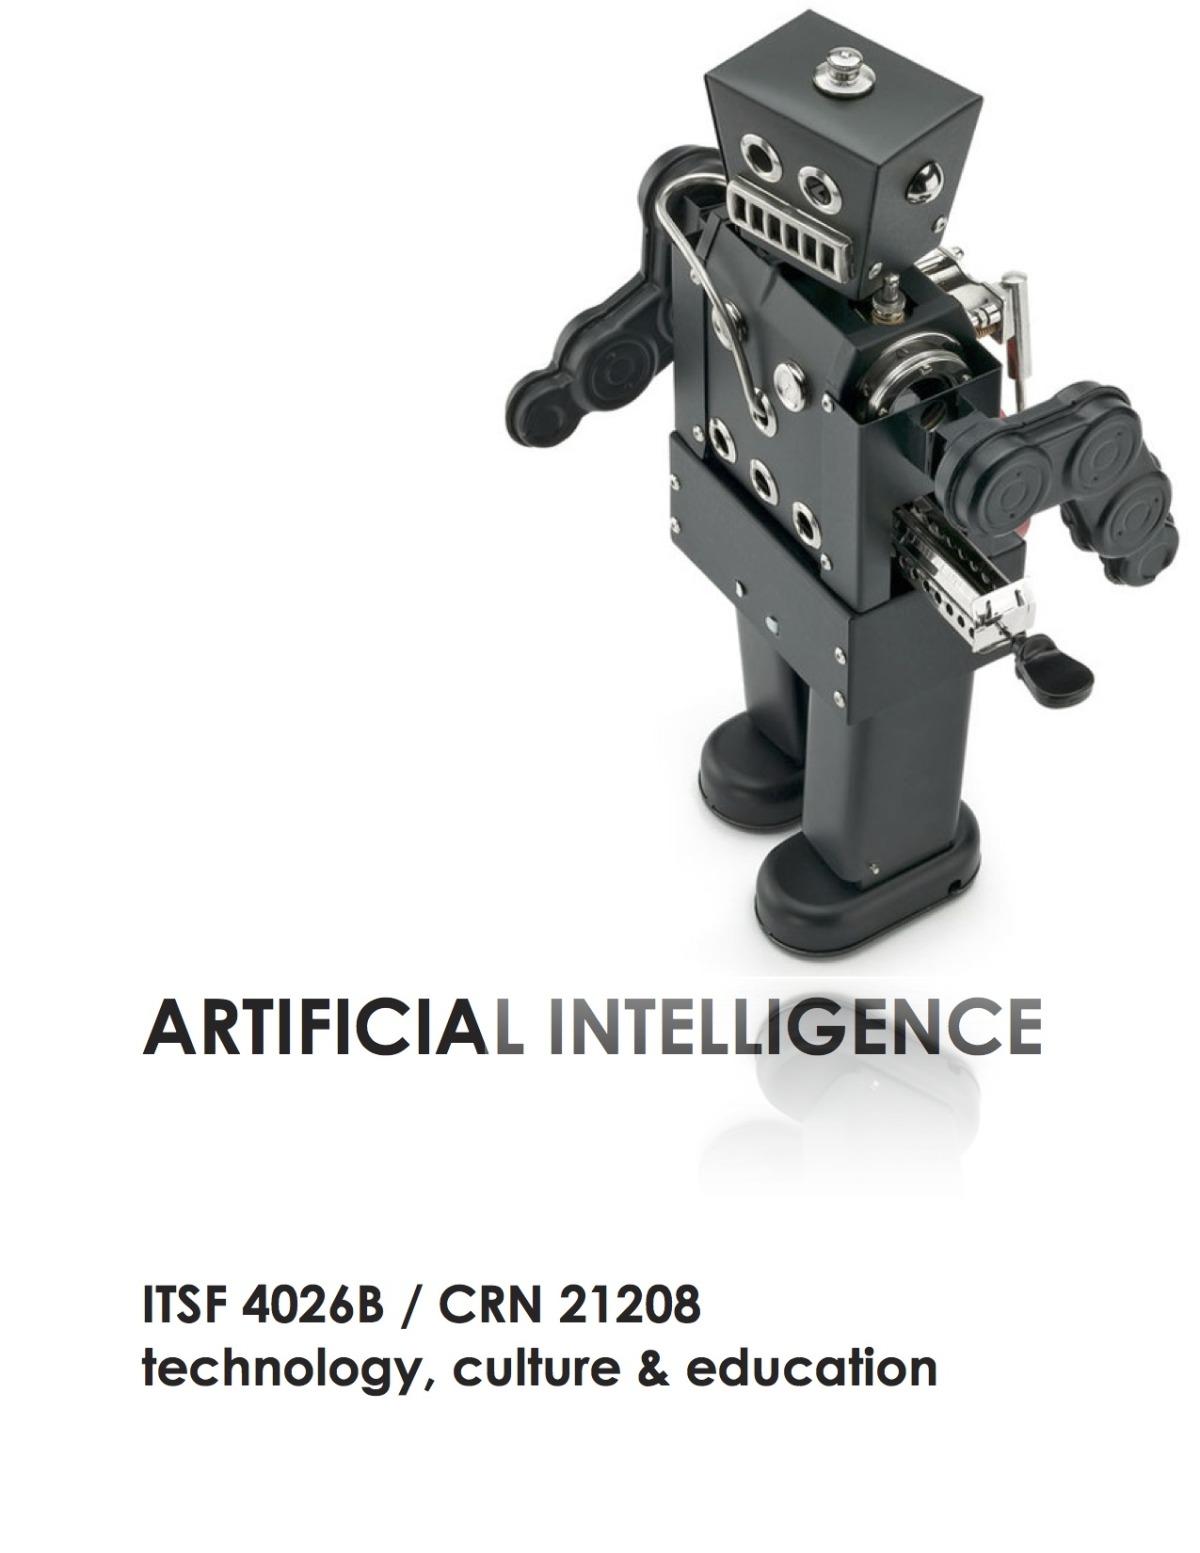 itsf 4026b flyers - artificial intelligence.jpg